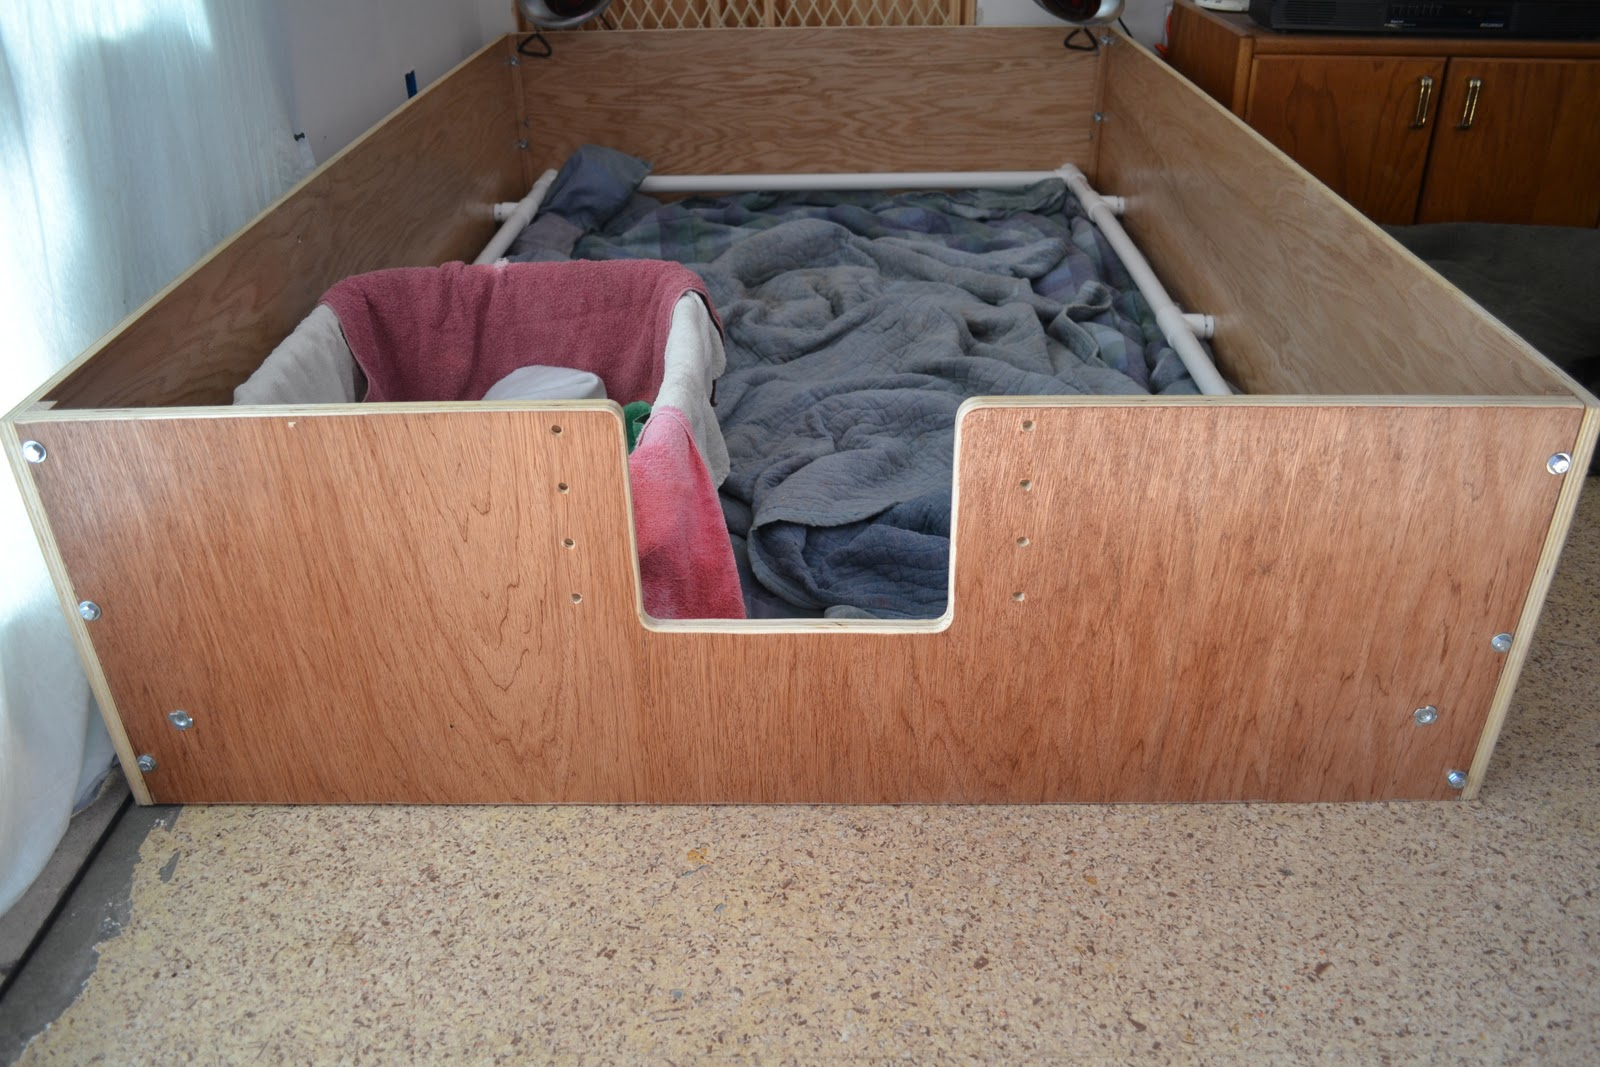 Whelping Box With Pig Rail Pawtuckaway Labrador Retrievers